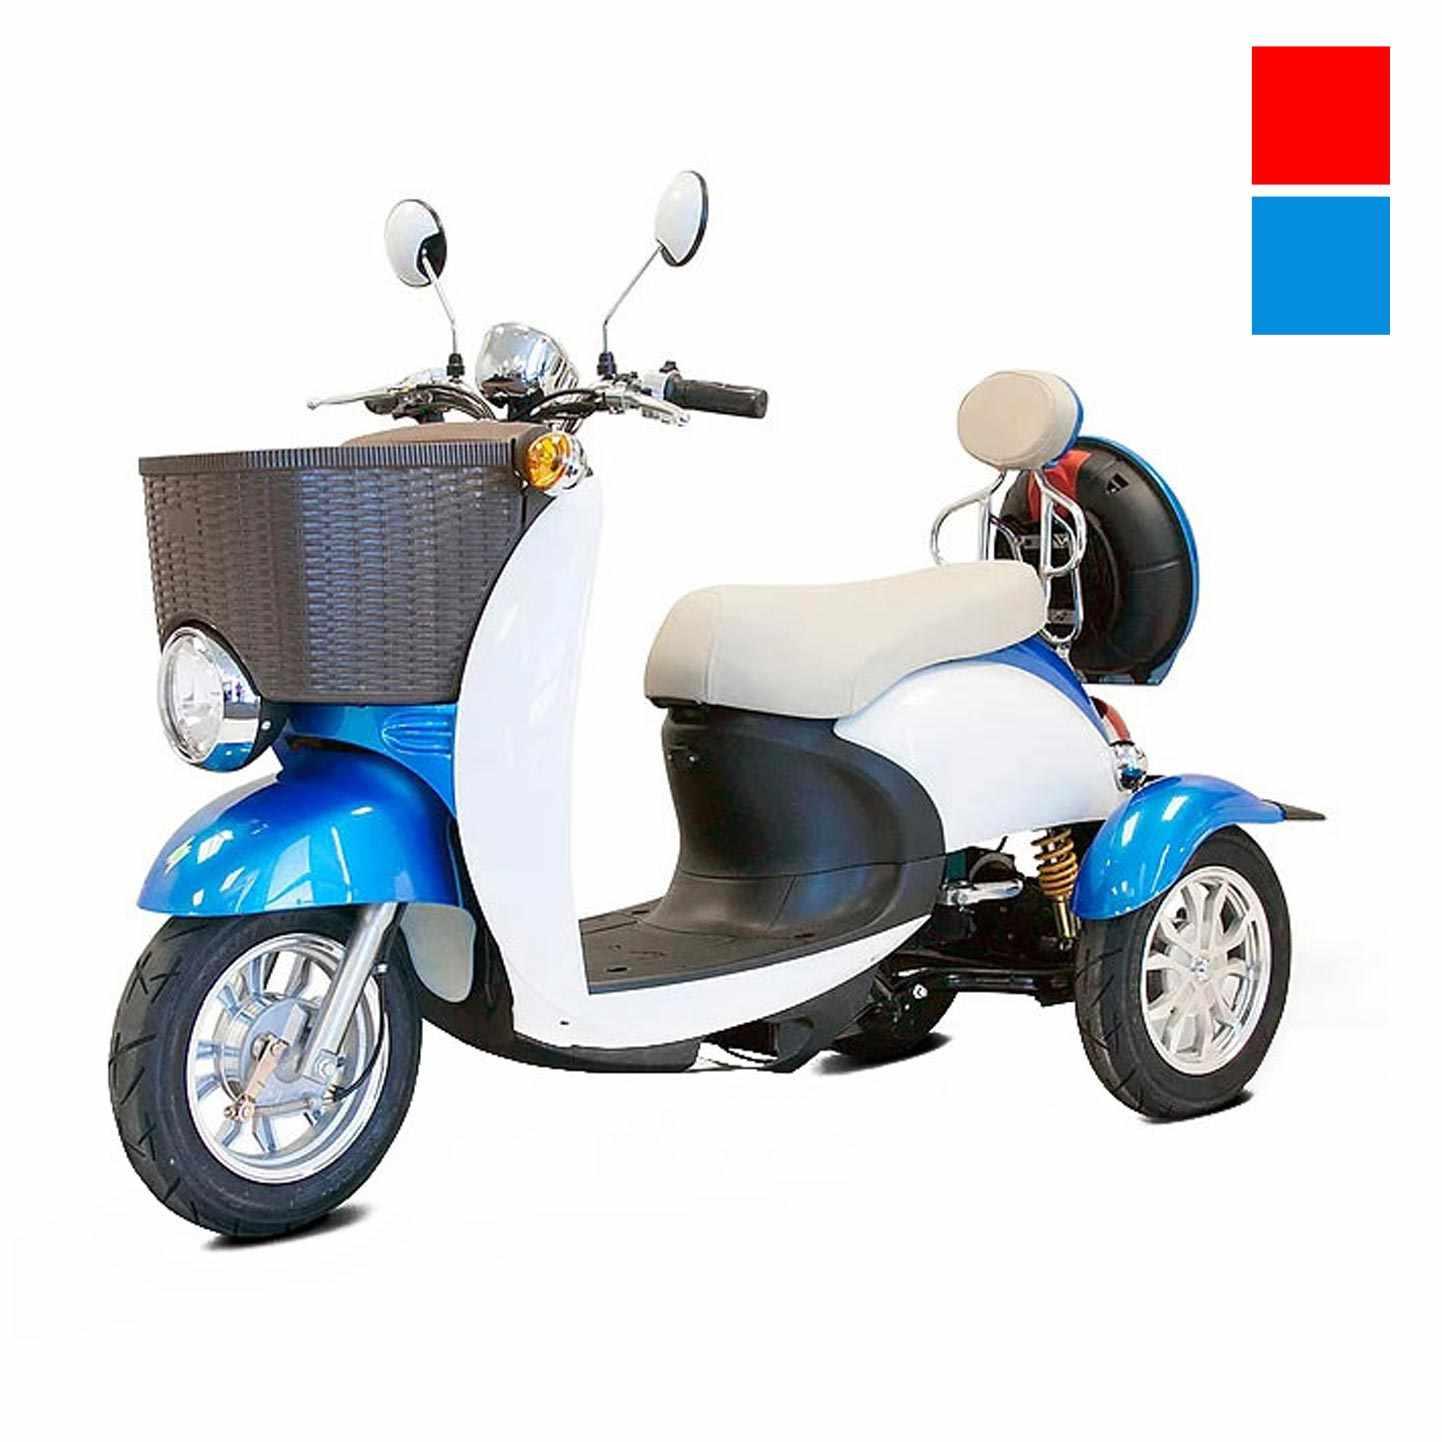 EWheels EW-11 Three Wheel Scooter